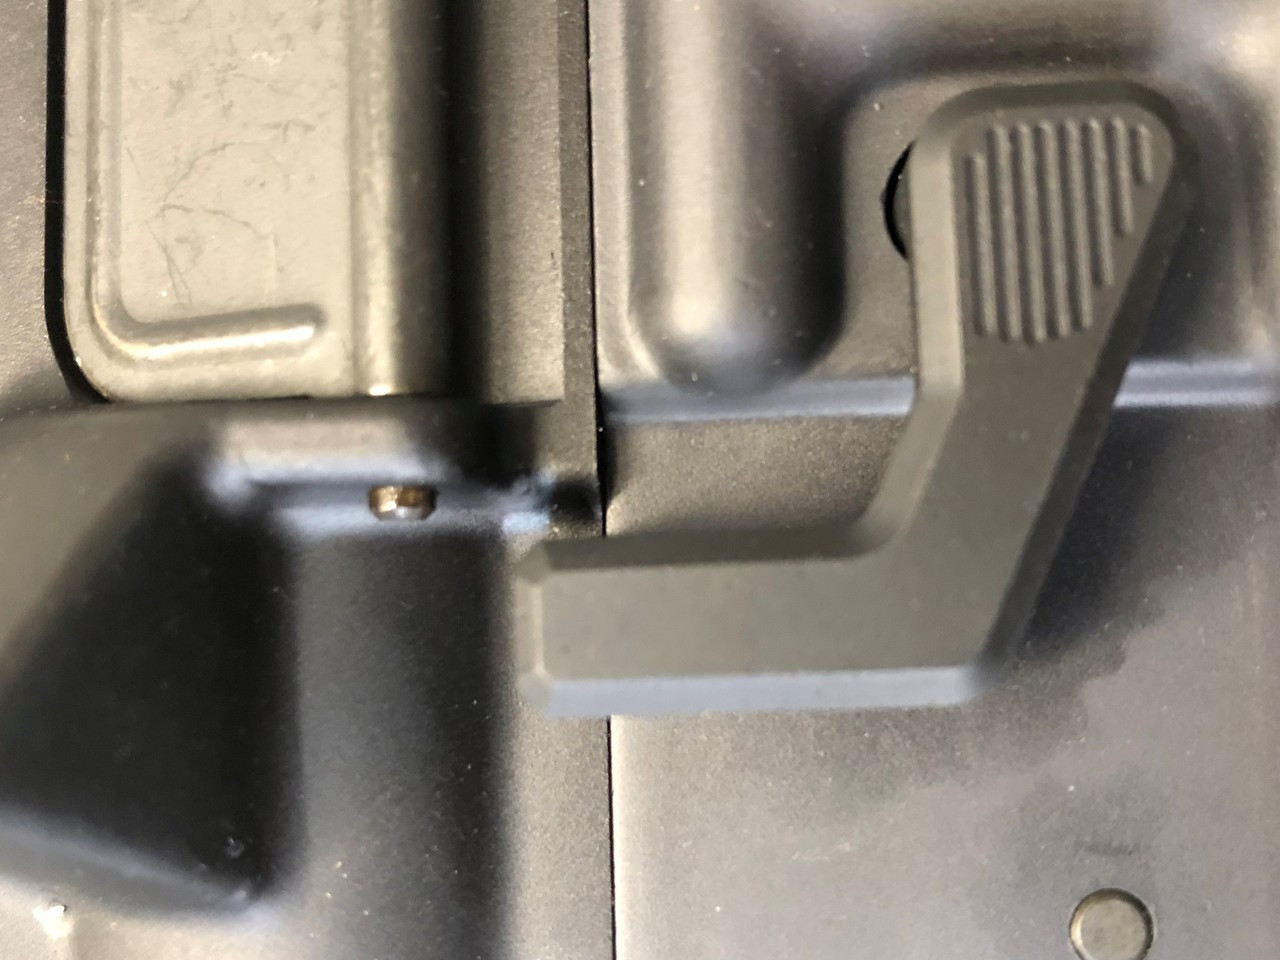 Smith & Wesson M&P15 VTAC II CALIFORNIA LEGAL - .223/5.56